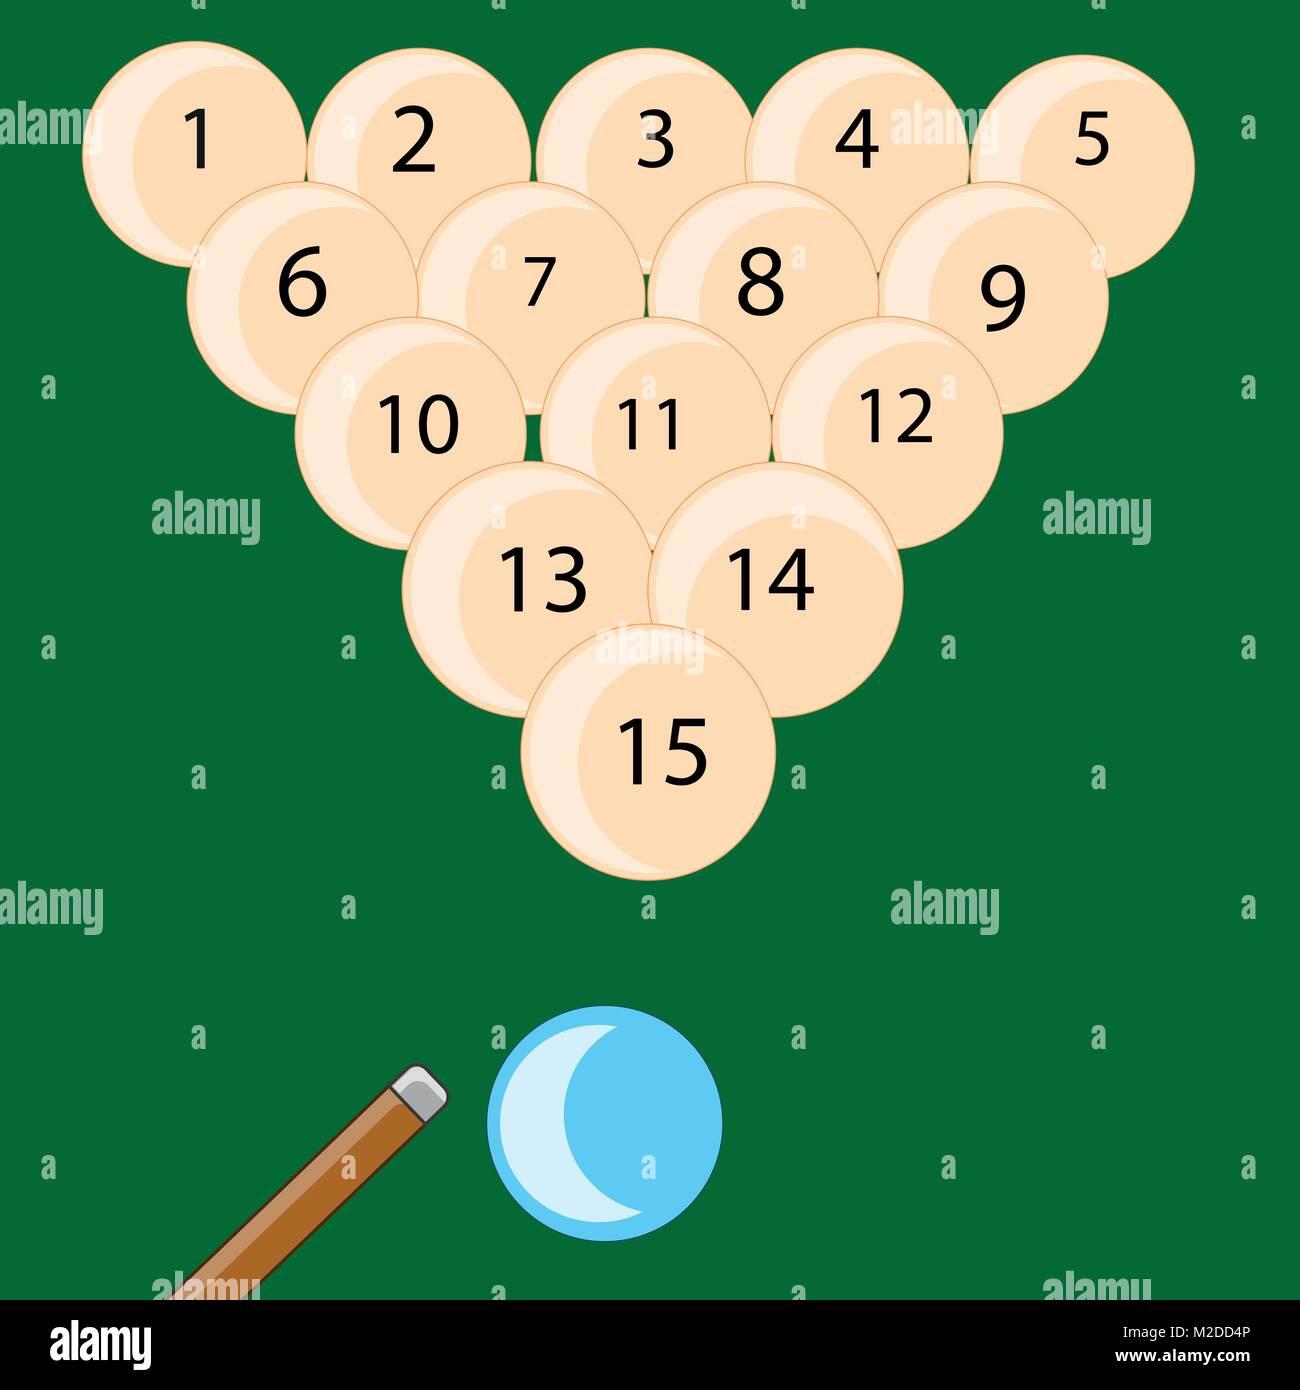 Desk play billiards - Stock Vector